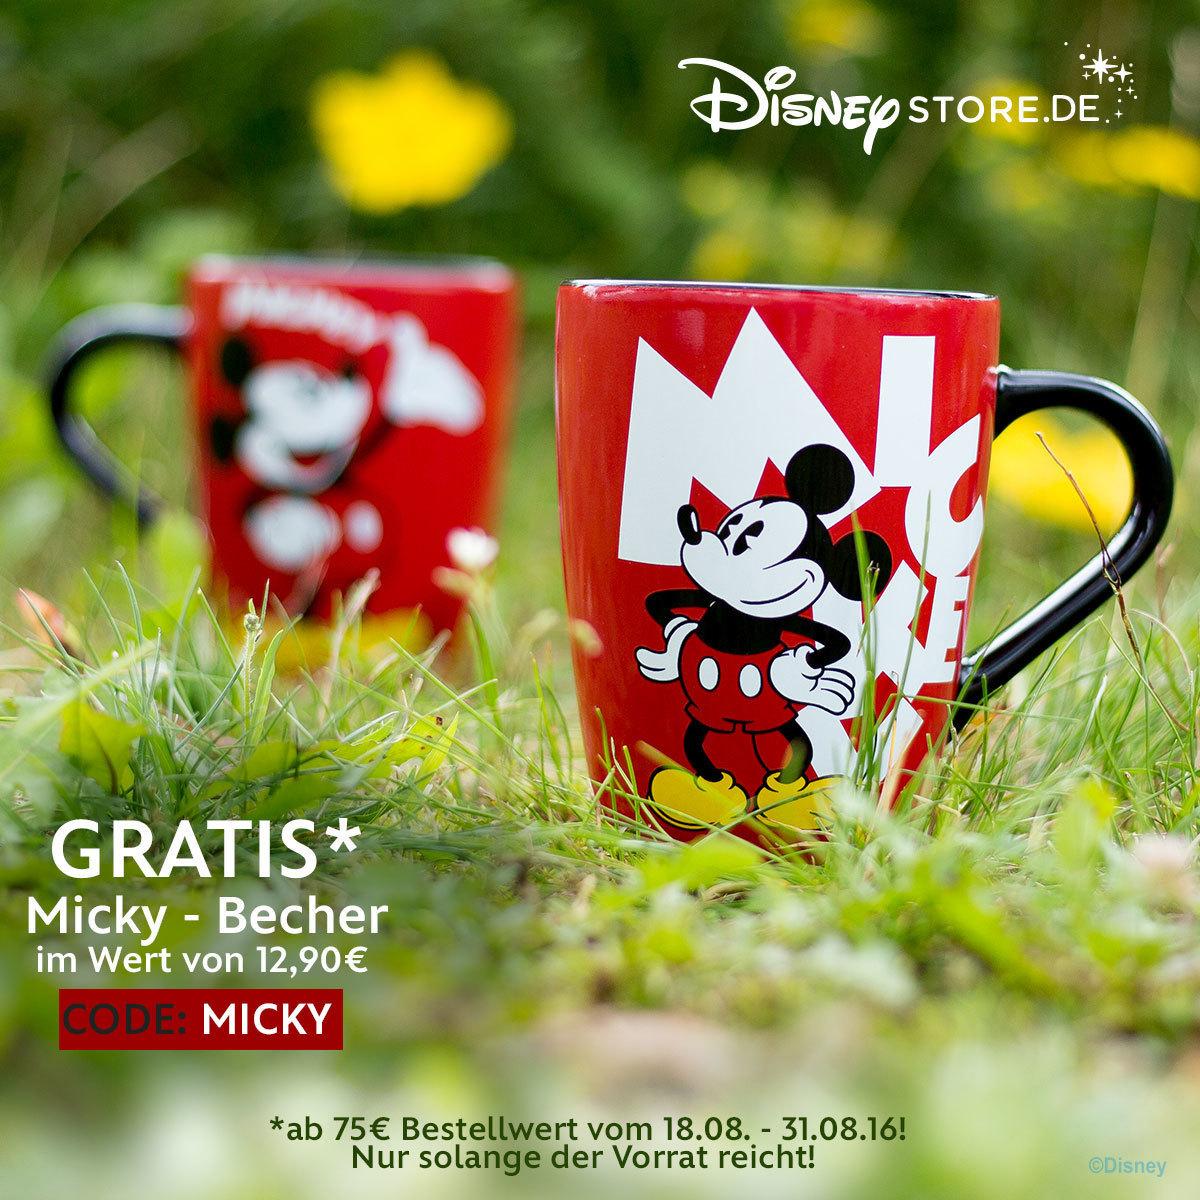 Disney Store Gratis Micky Becher